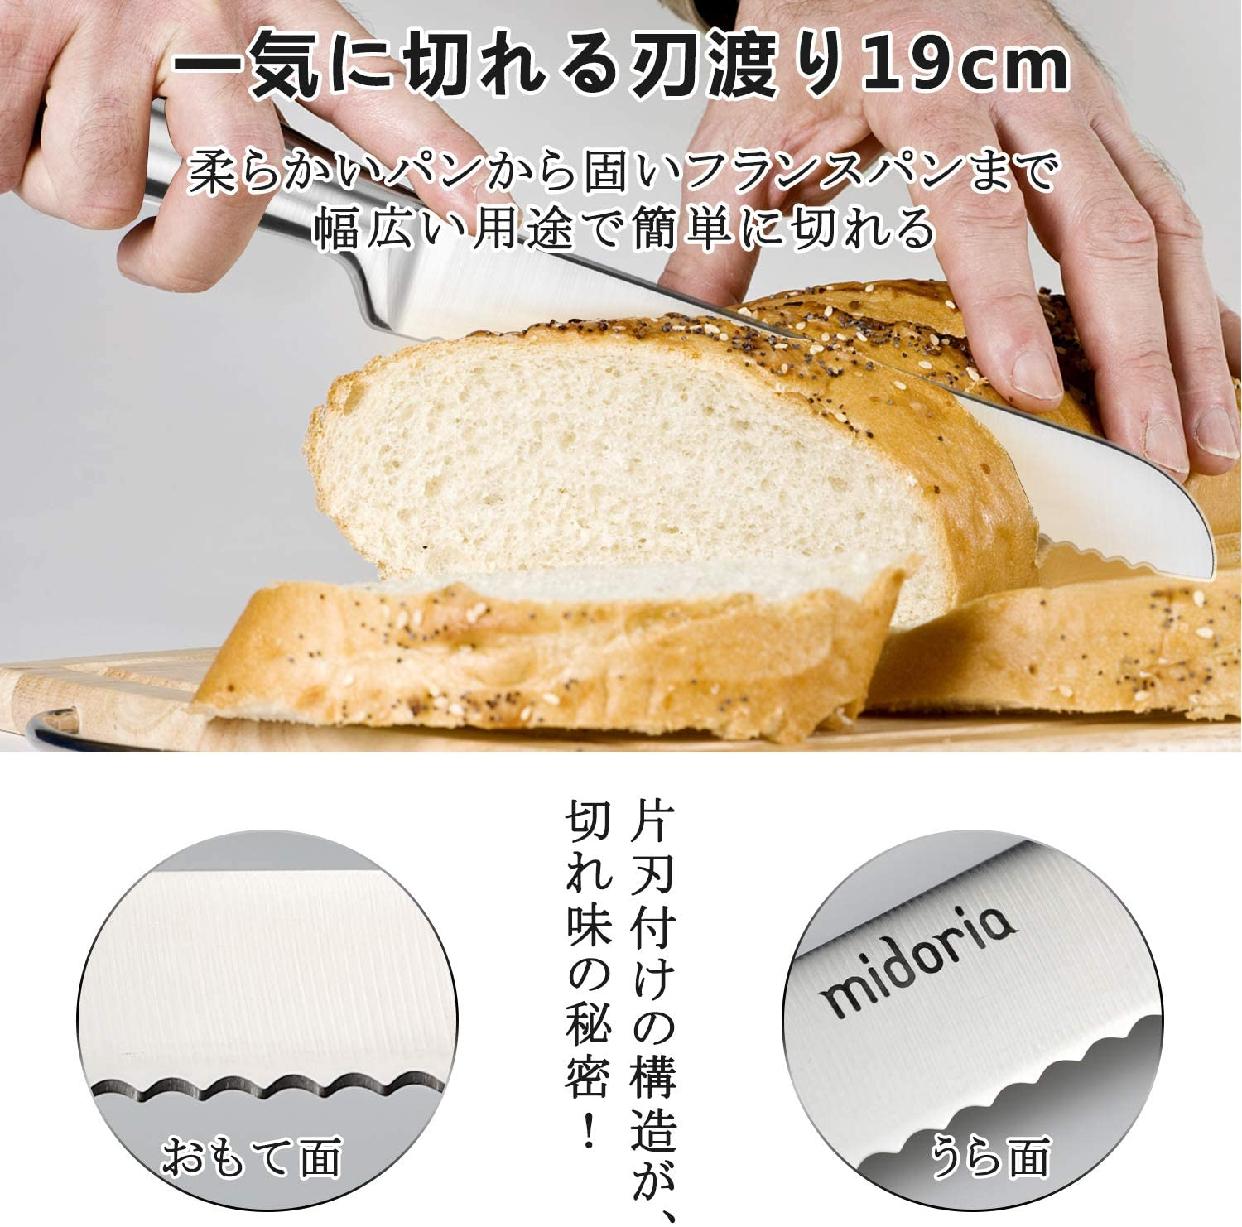 MIDORIA(ミドリア) パン切りナイフ シルバーの商品画像2